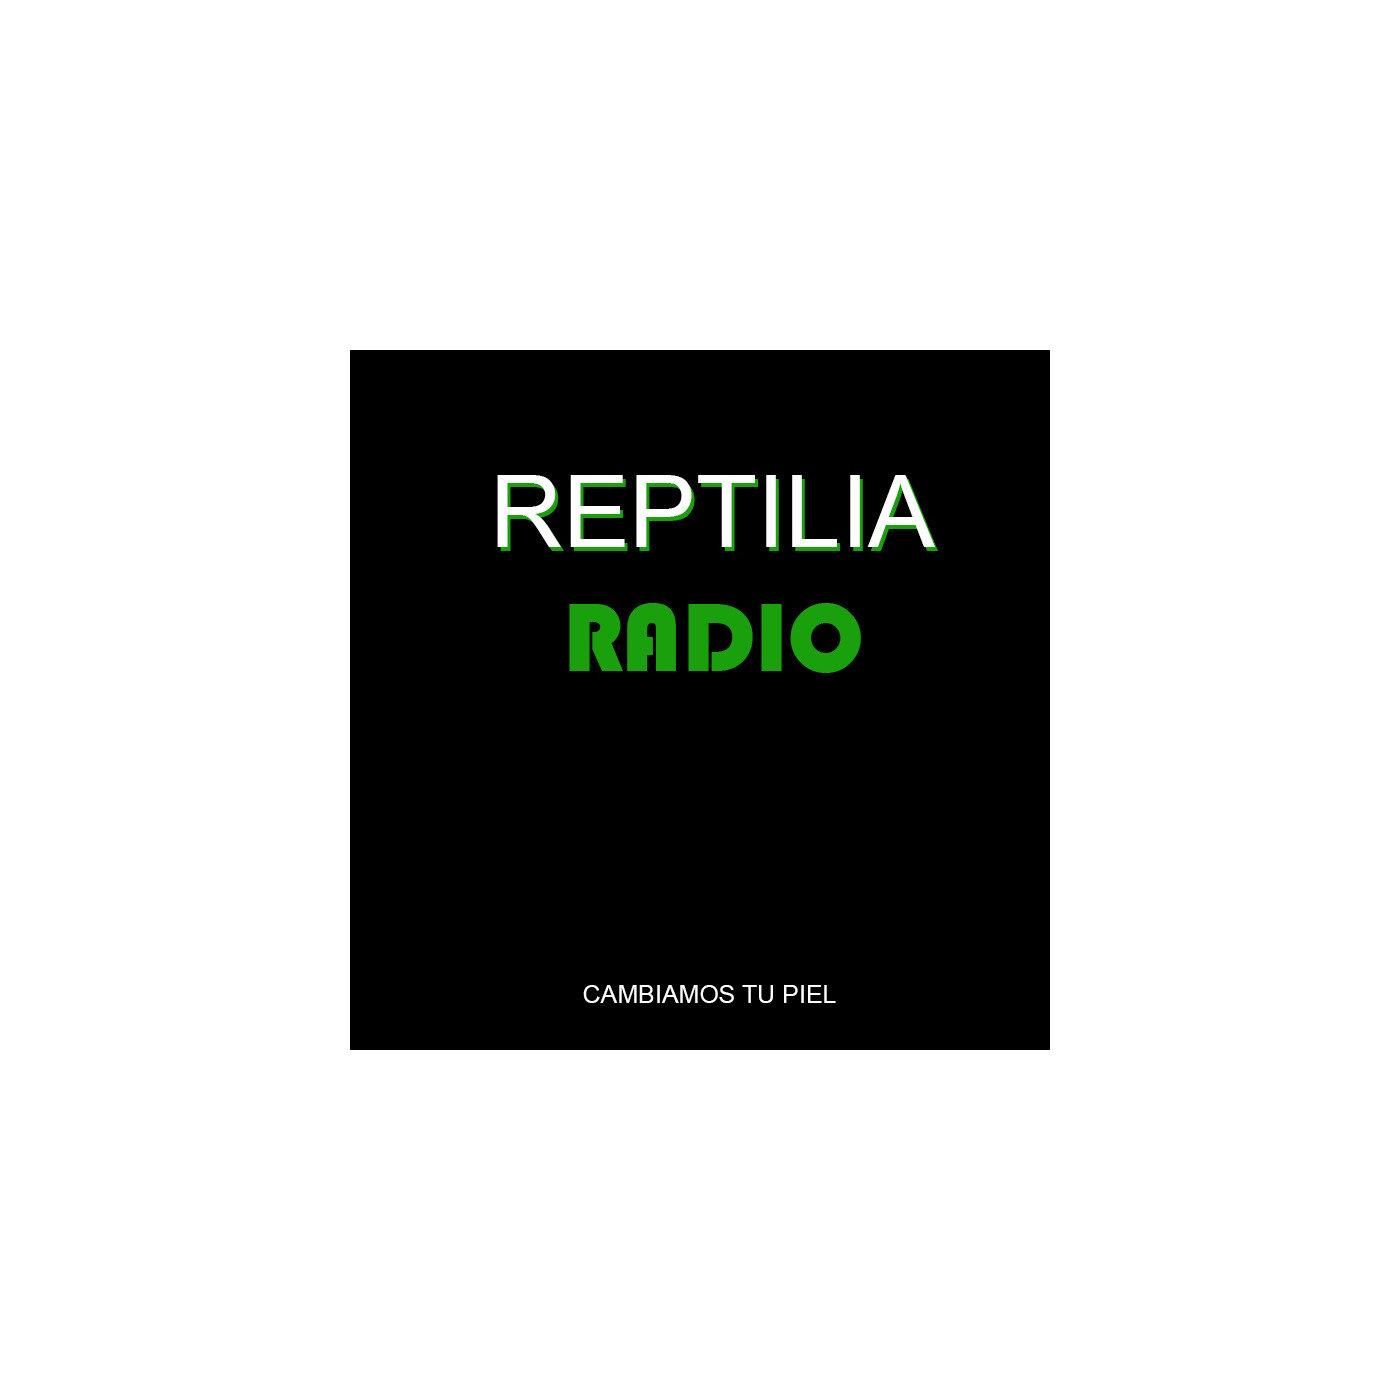 <![CDATA[Reptilia Radio]]>